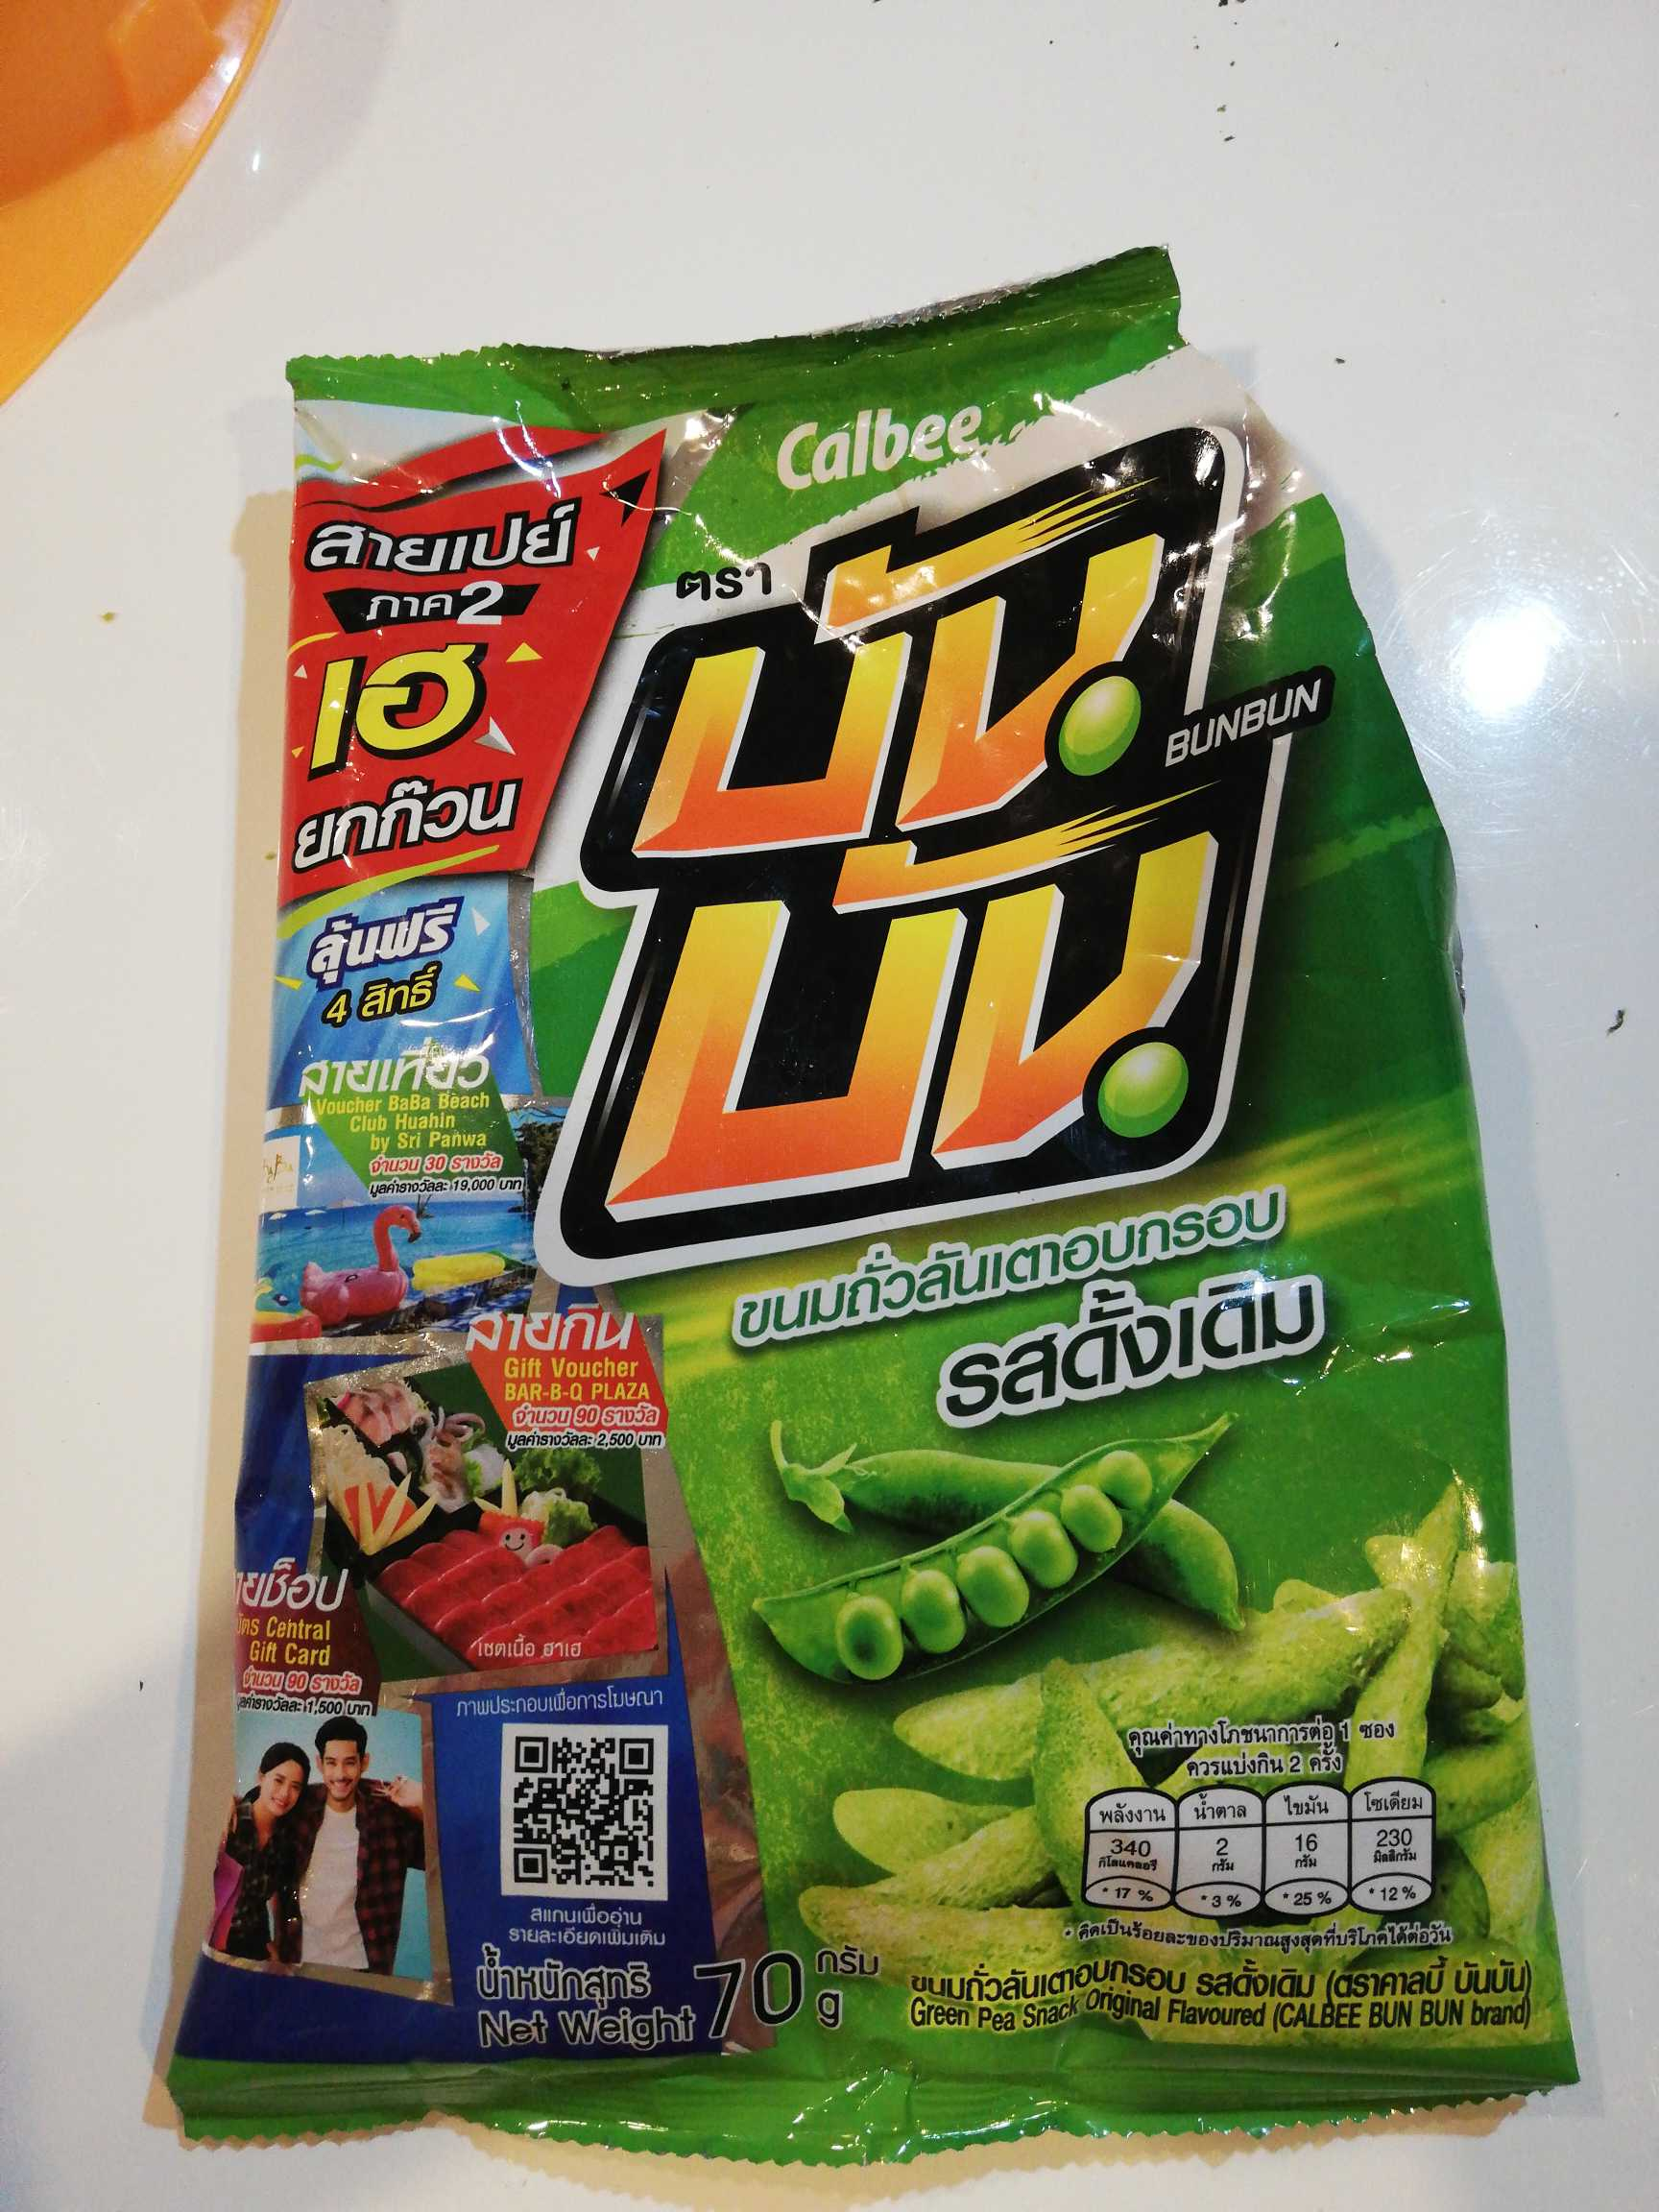 Закуска из зелёного горошка. green pea snack original flavoured.